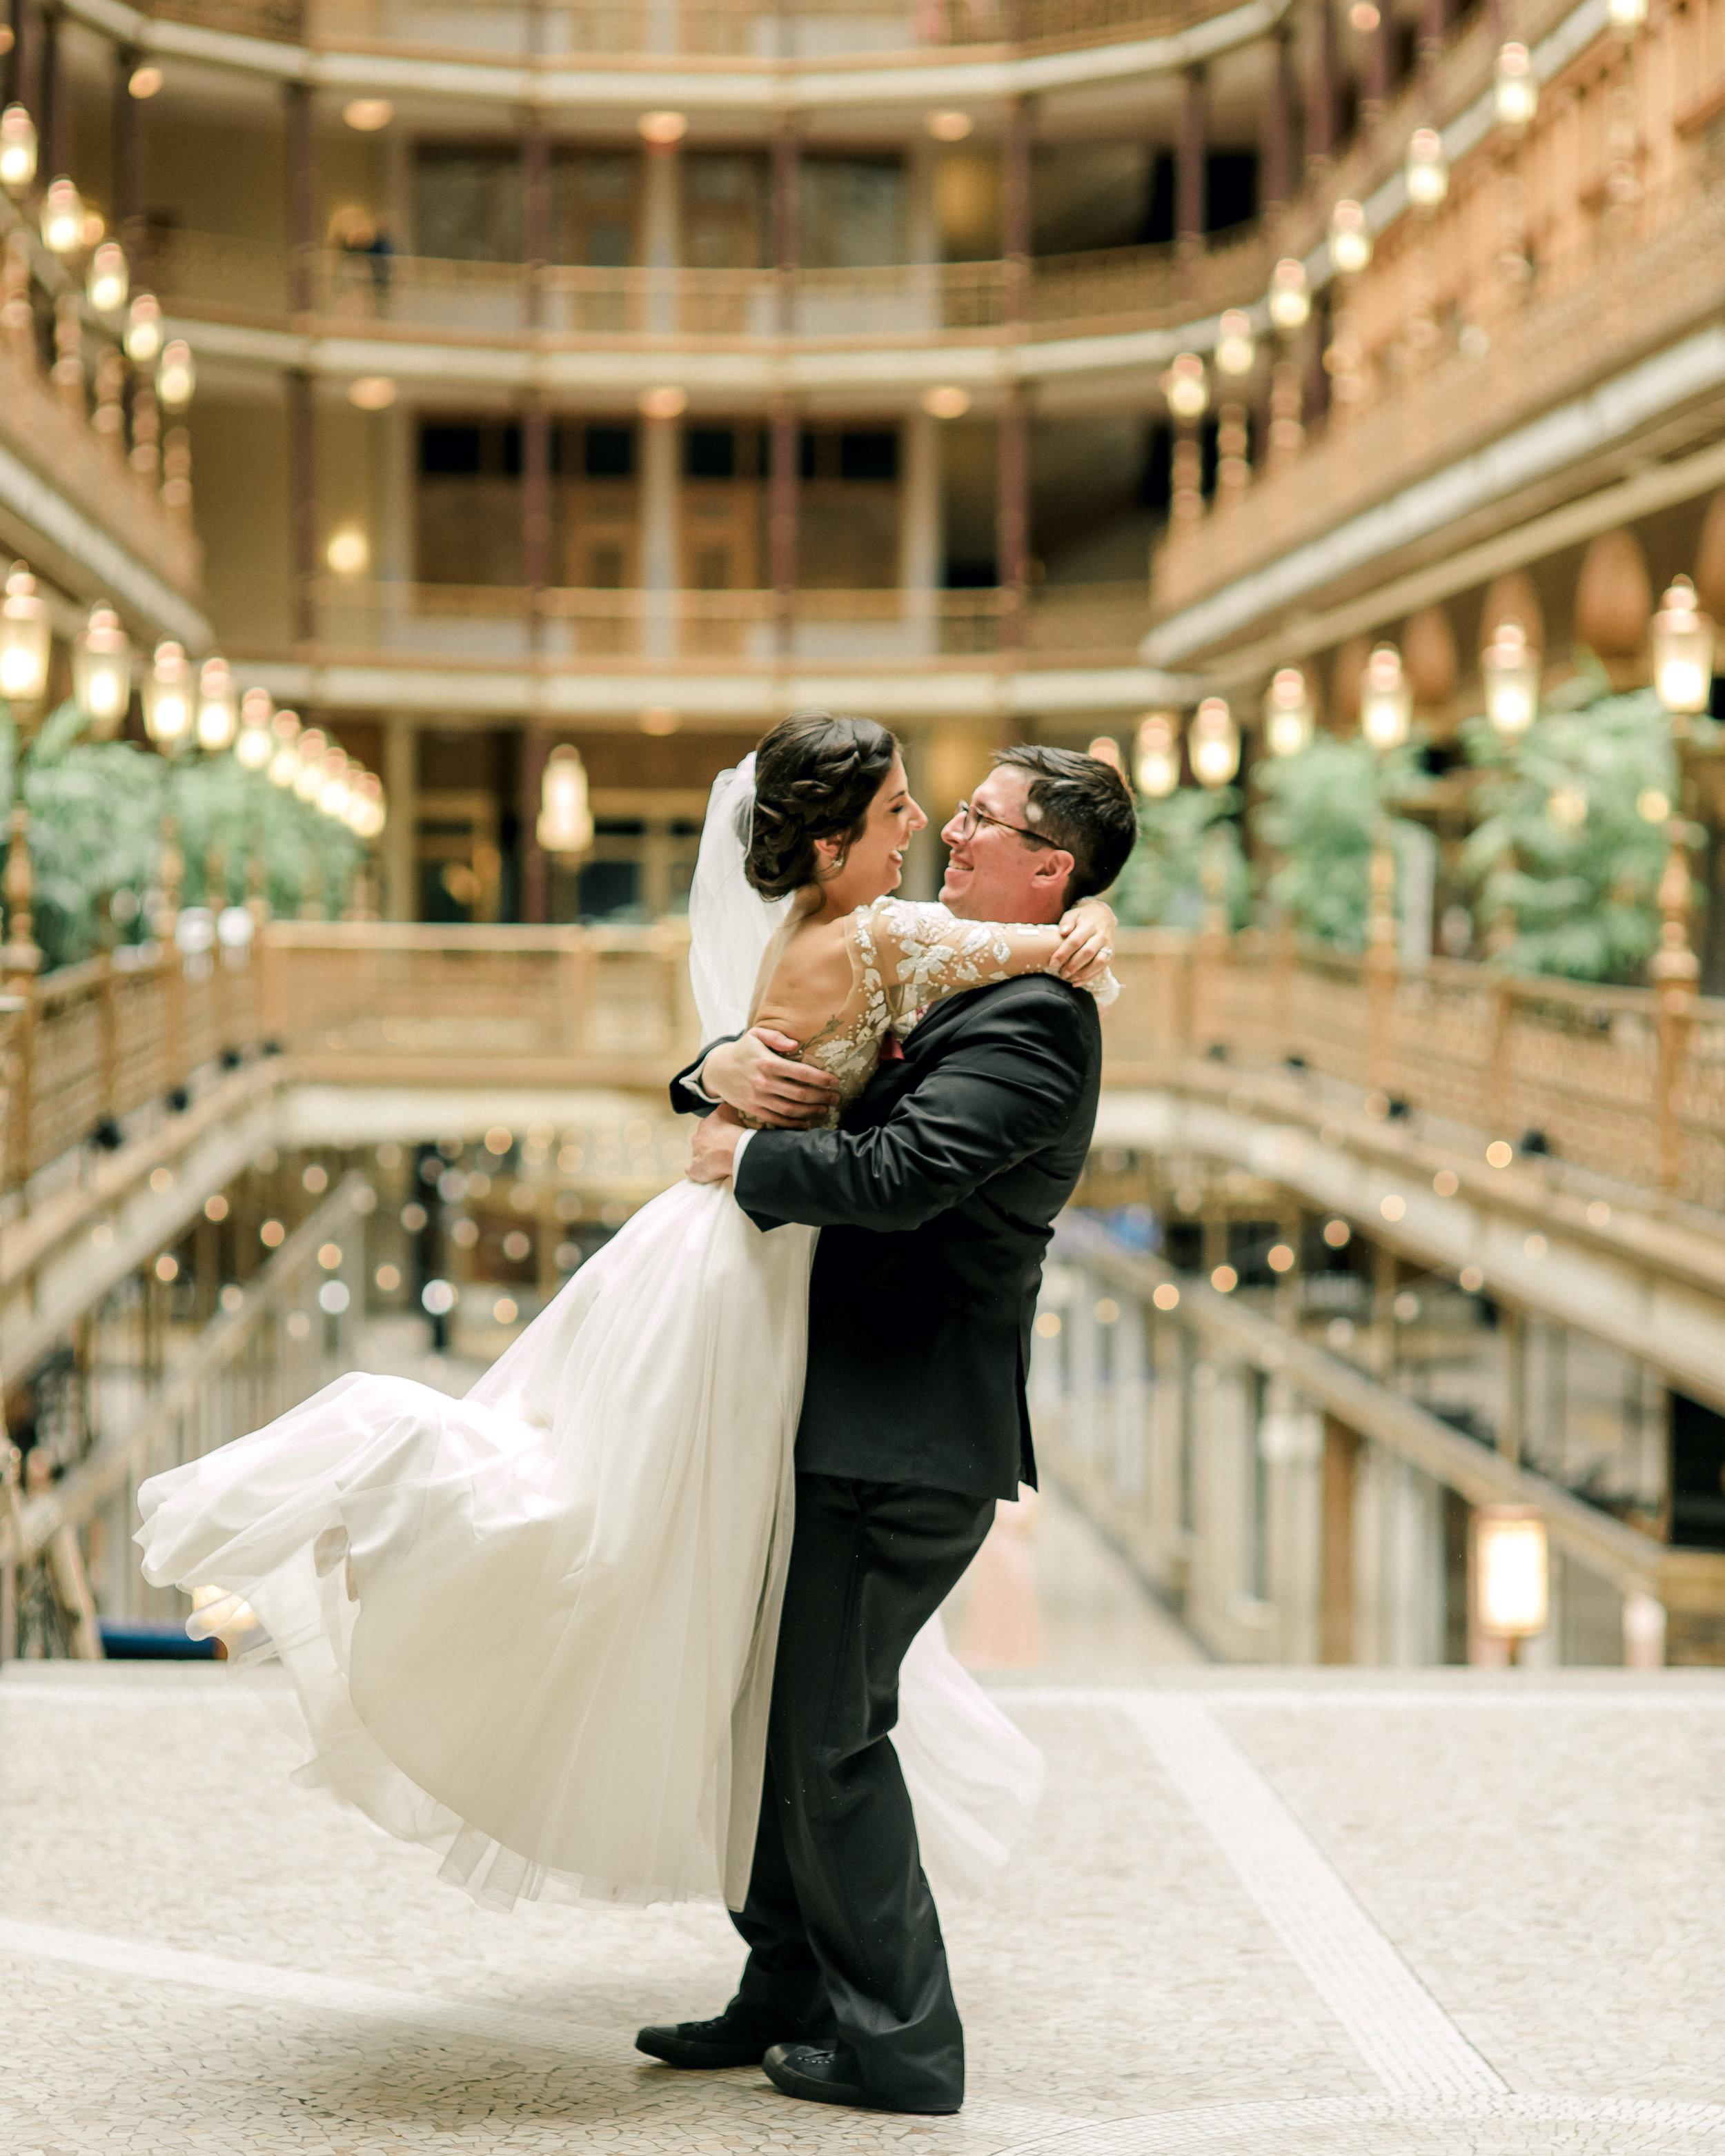 cleveland-wedding-photographer-great-lakes-brewing-arcade-0018.jpg